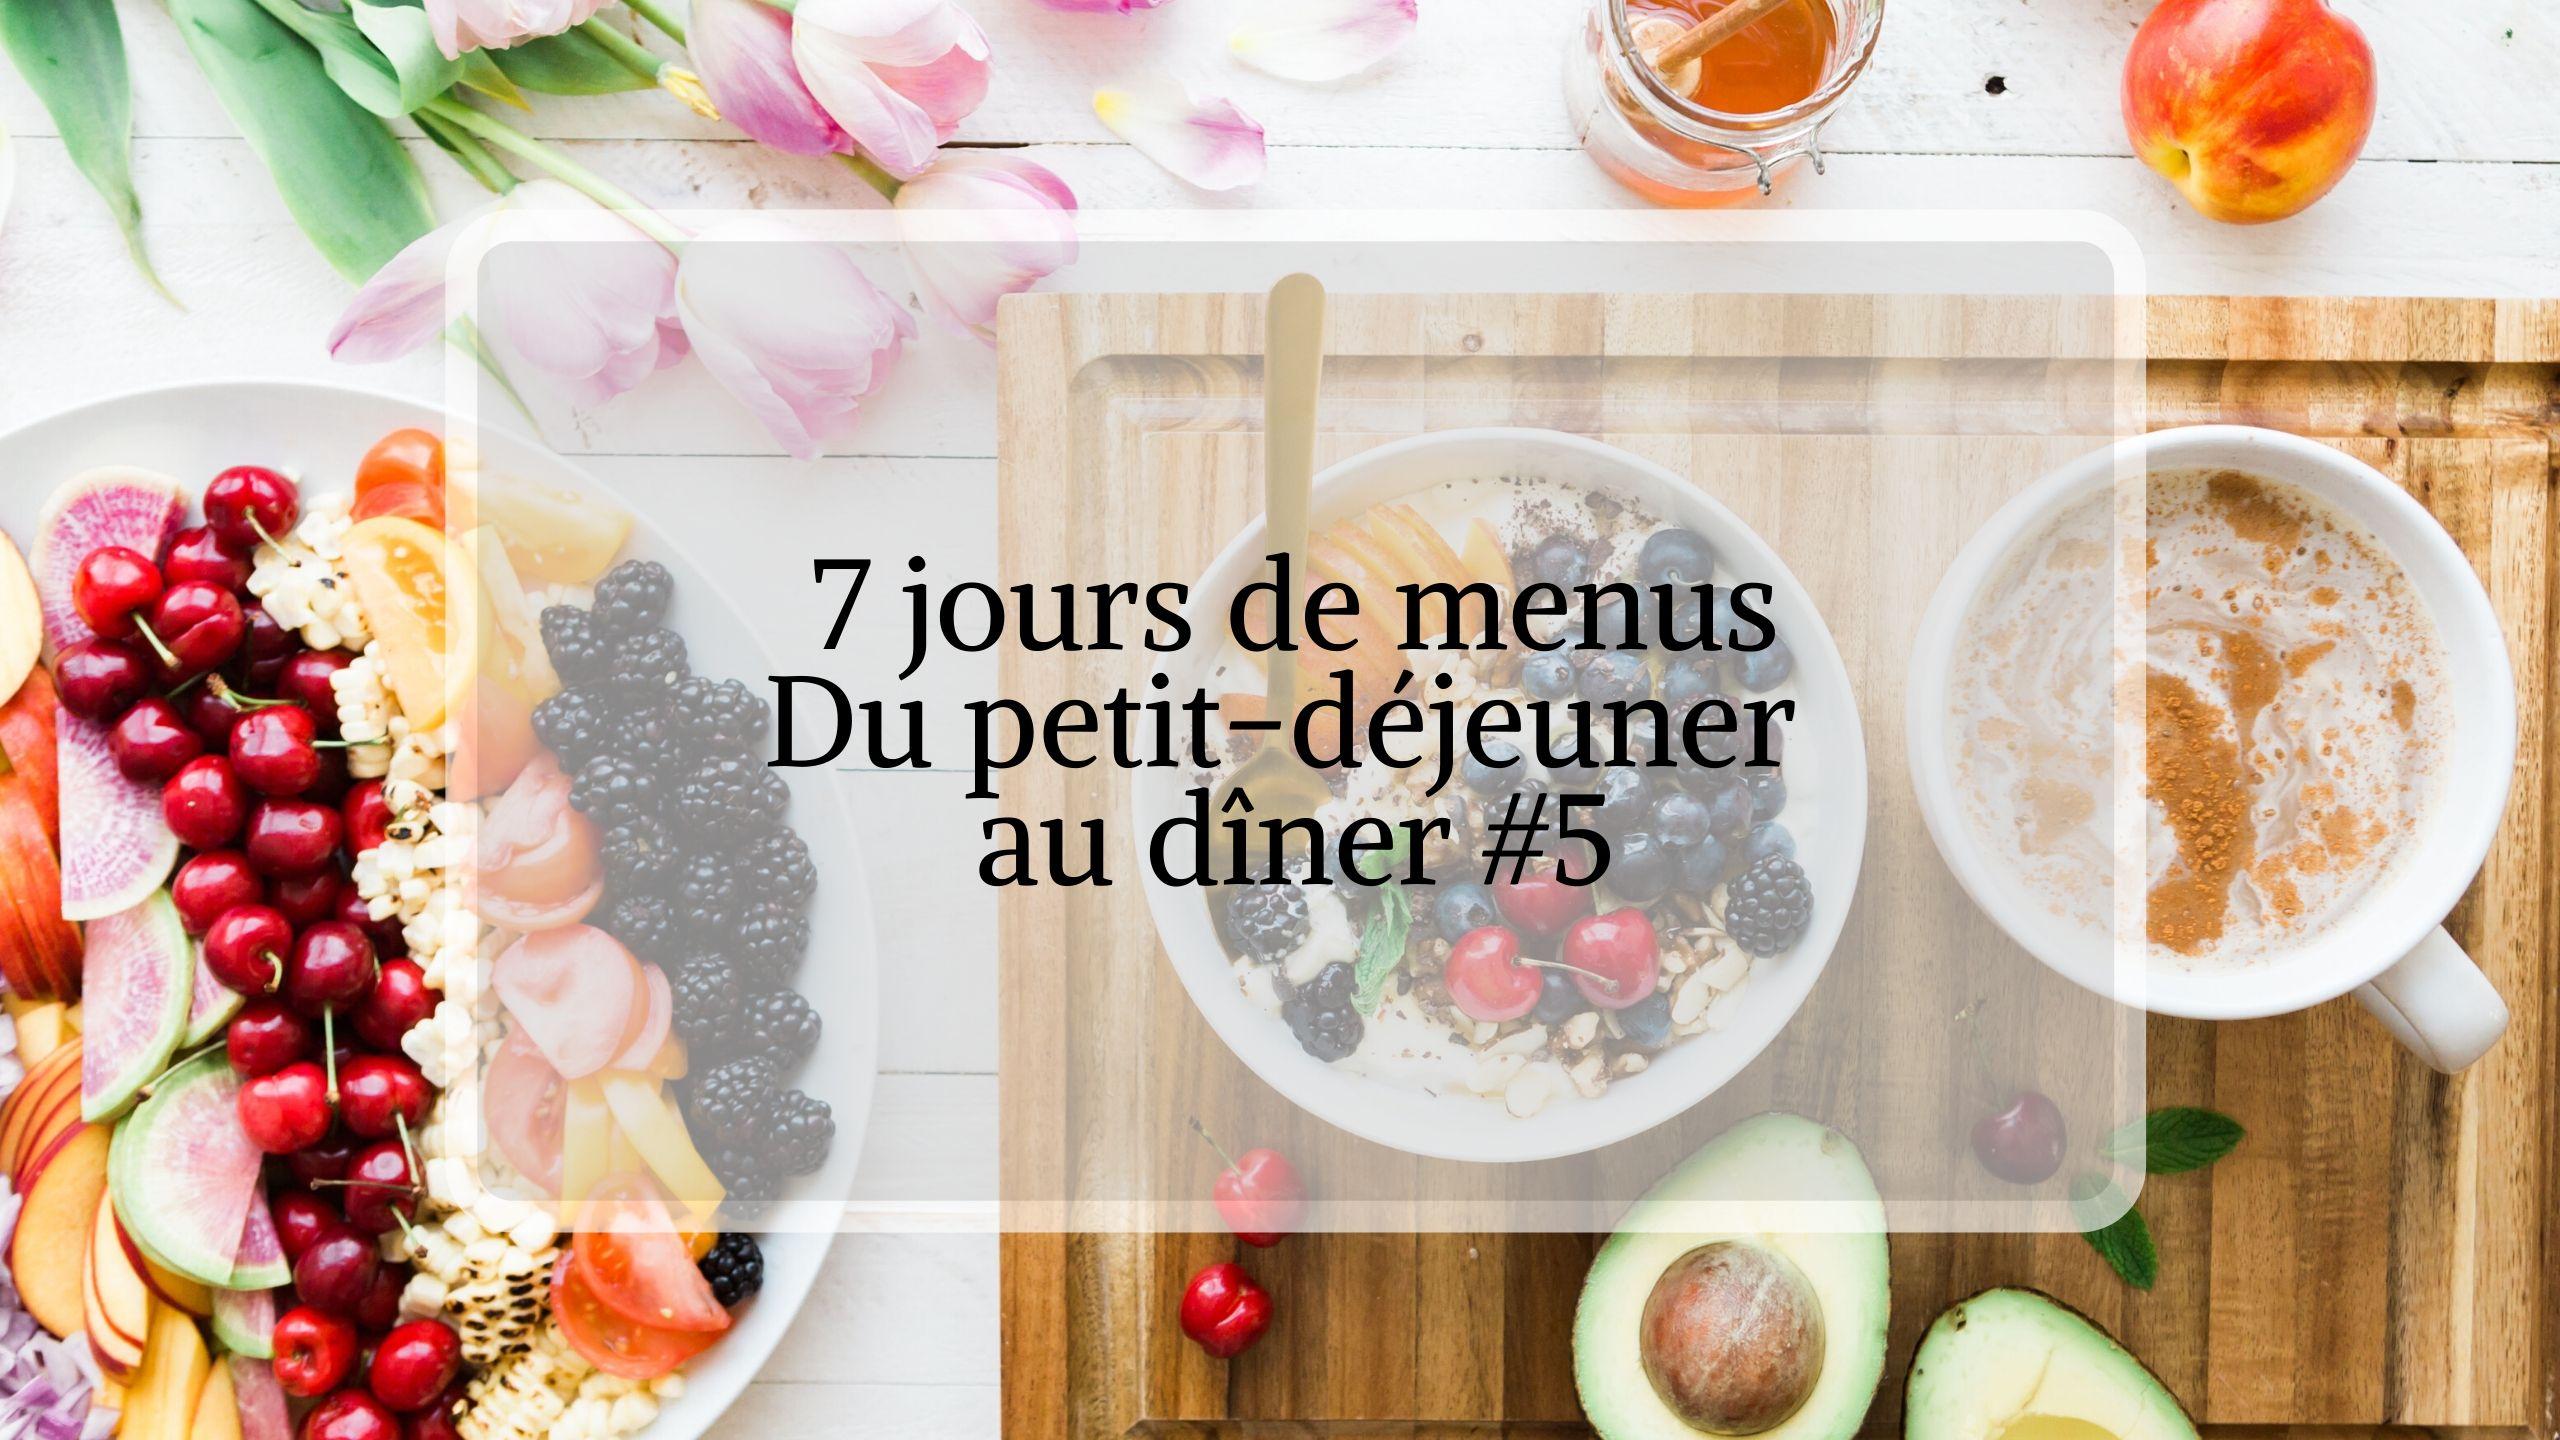 SEMAINIER MENU : Organisation repas pour la semaine